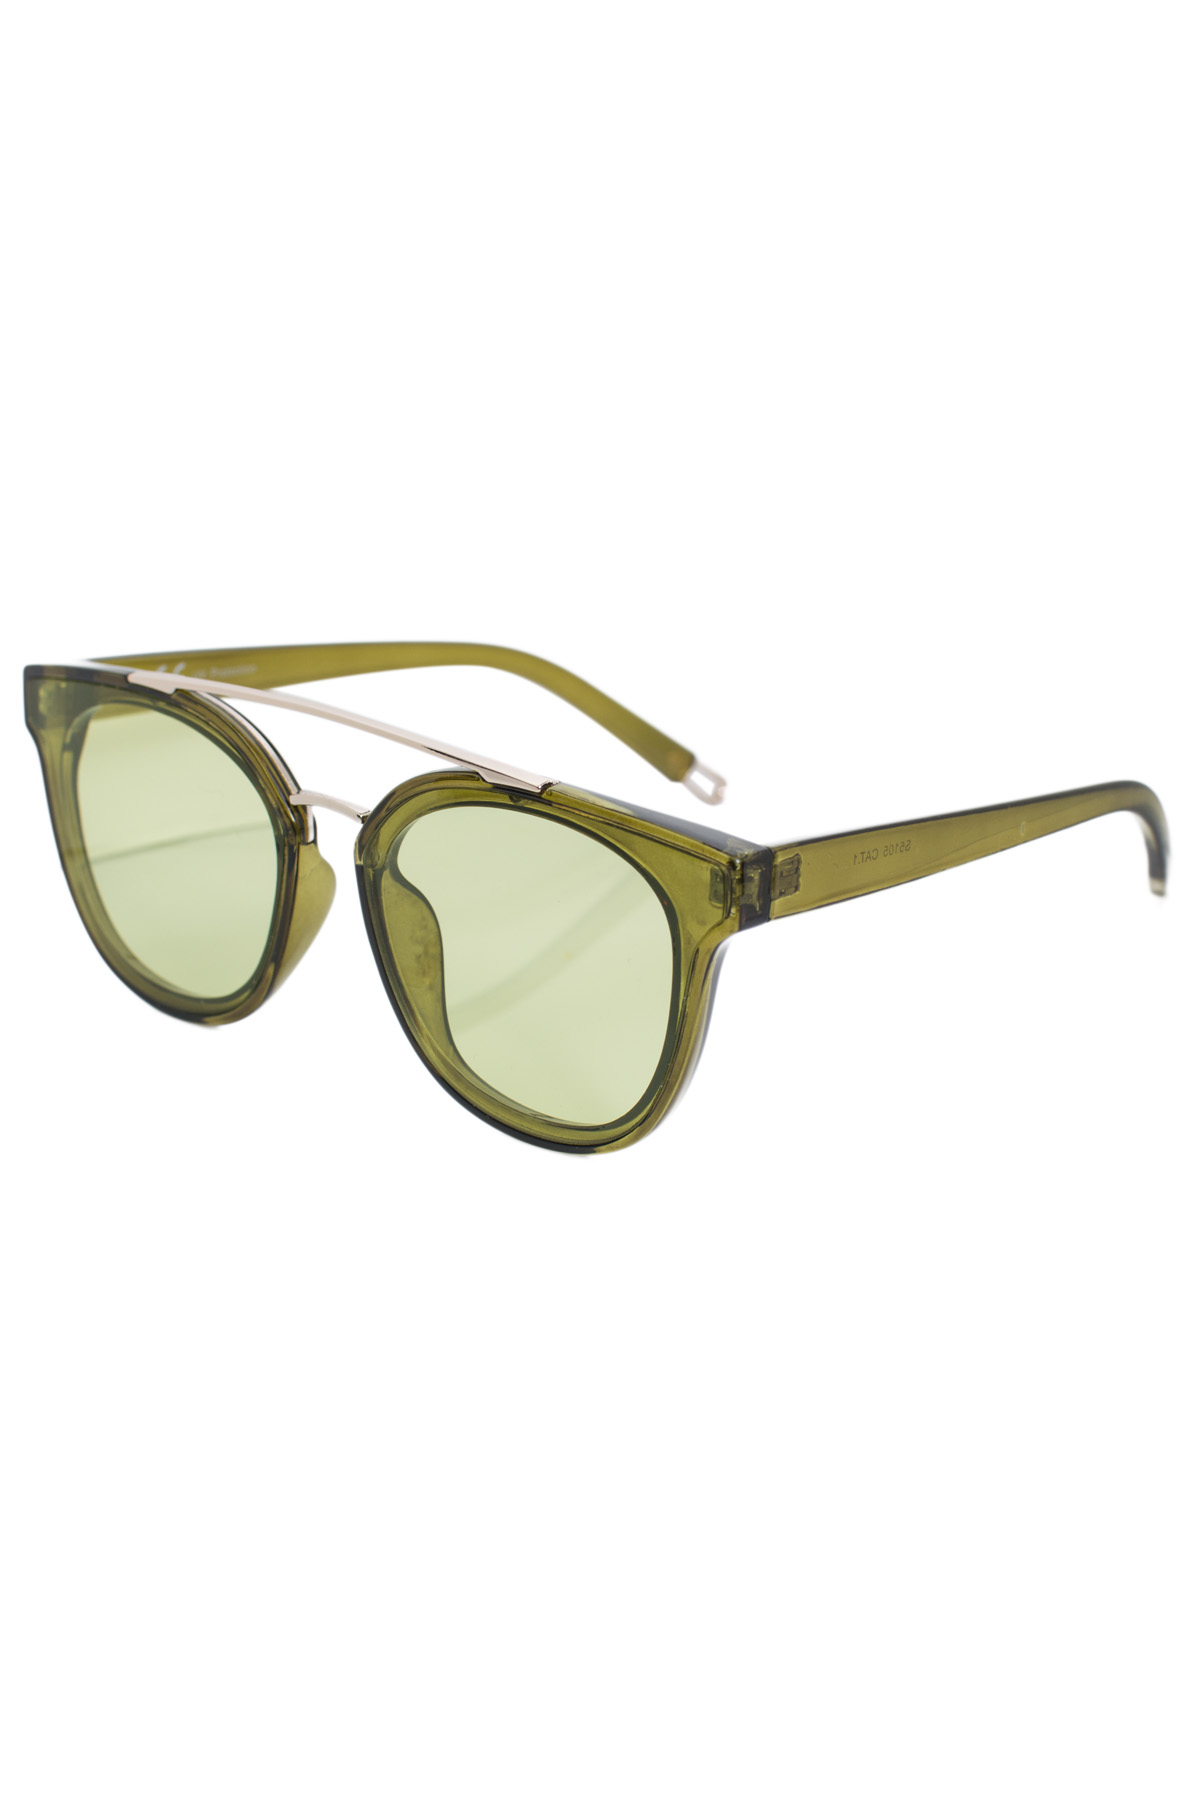 418c4b24c9 Γυαλιά ηλίου Elegance - Abebablom Store